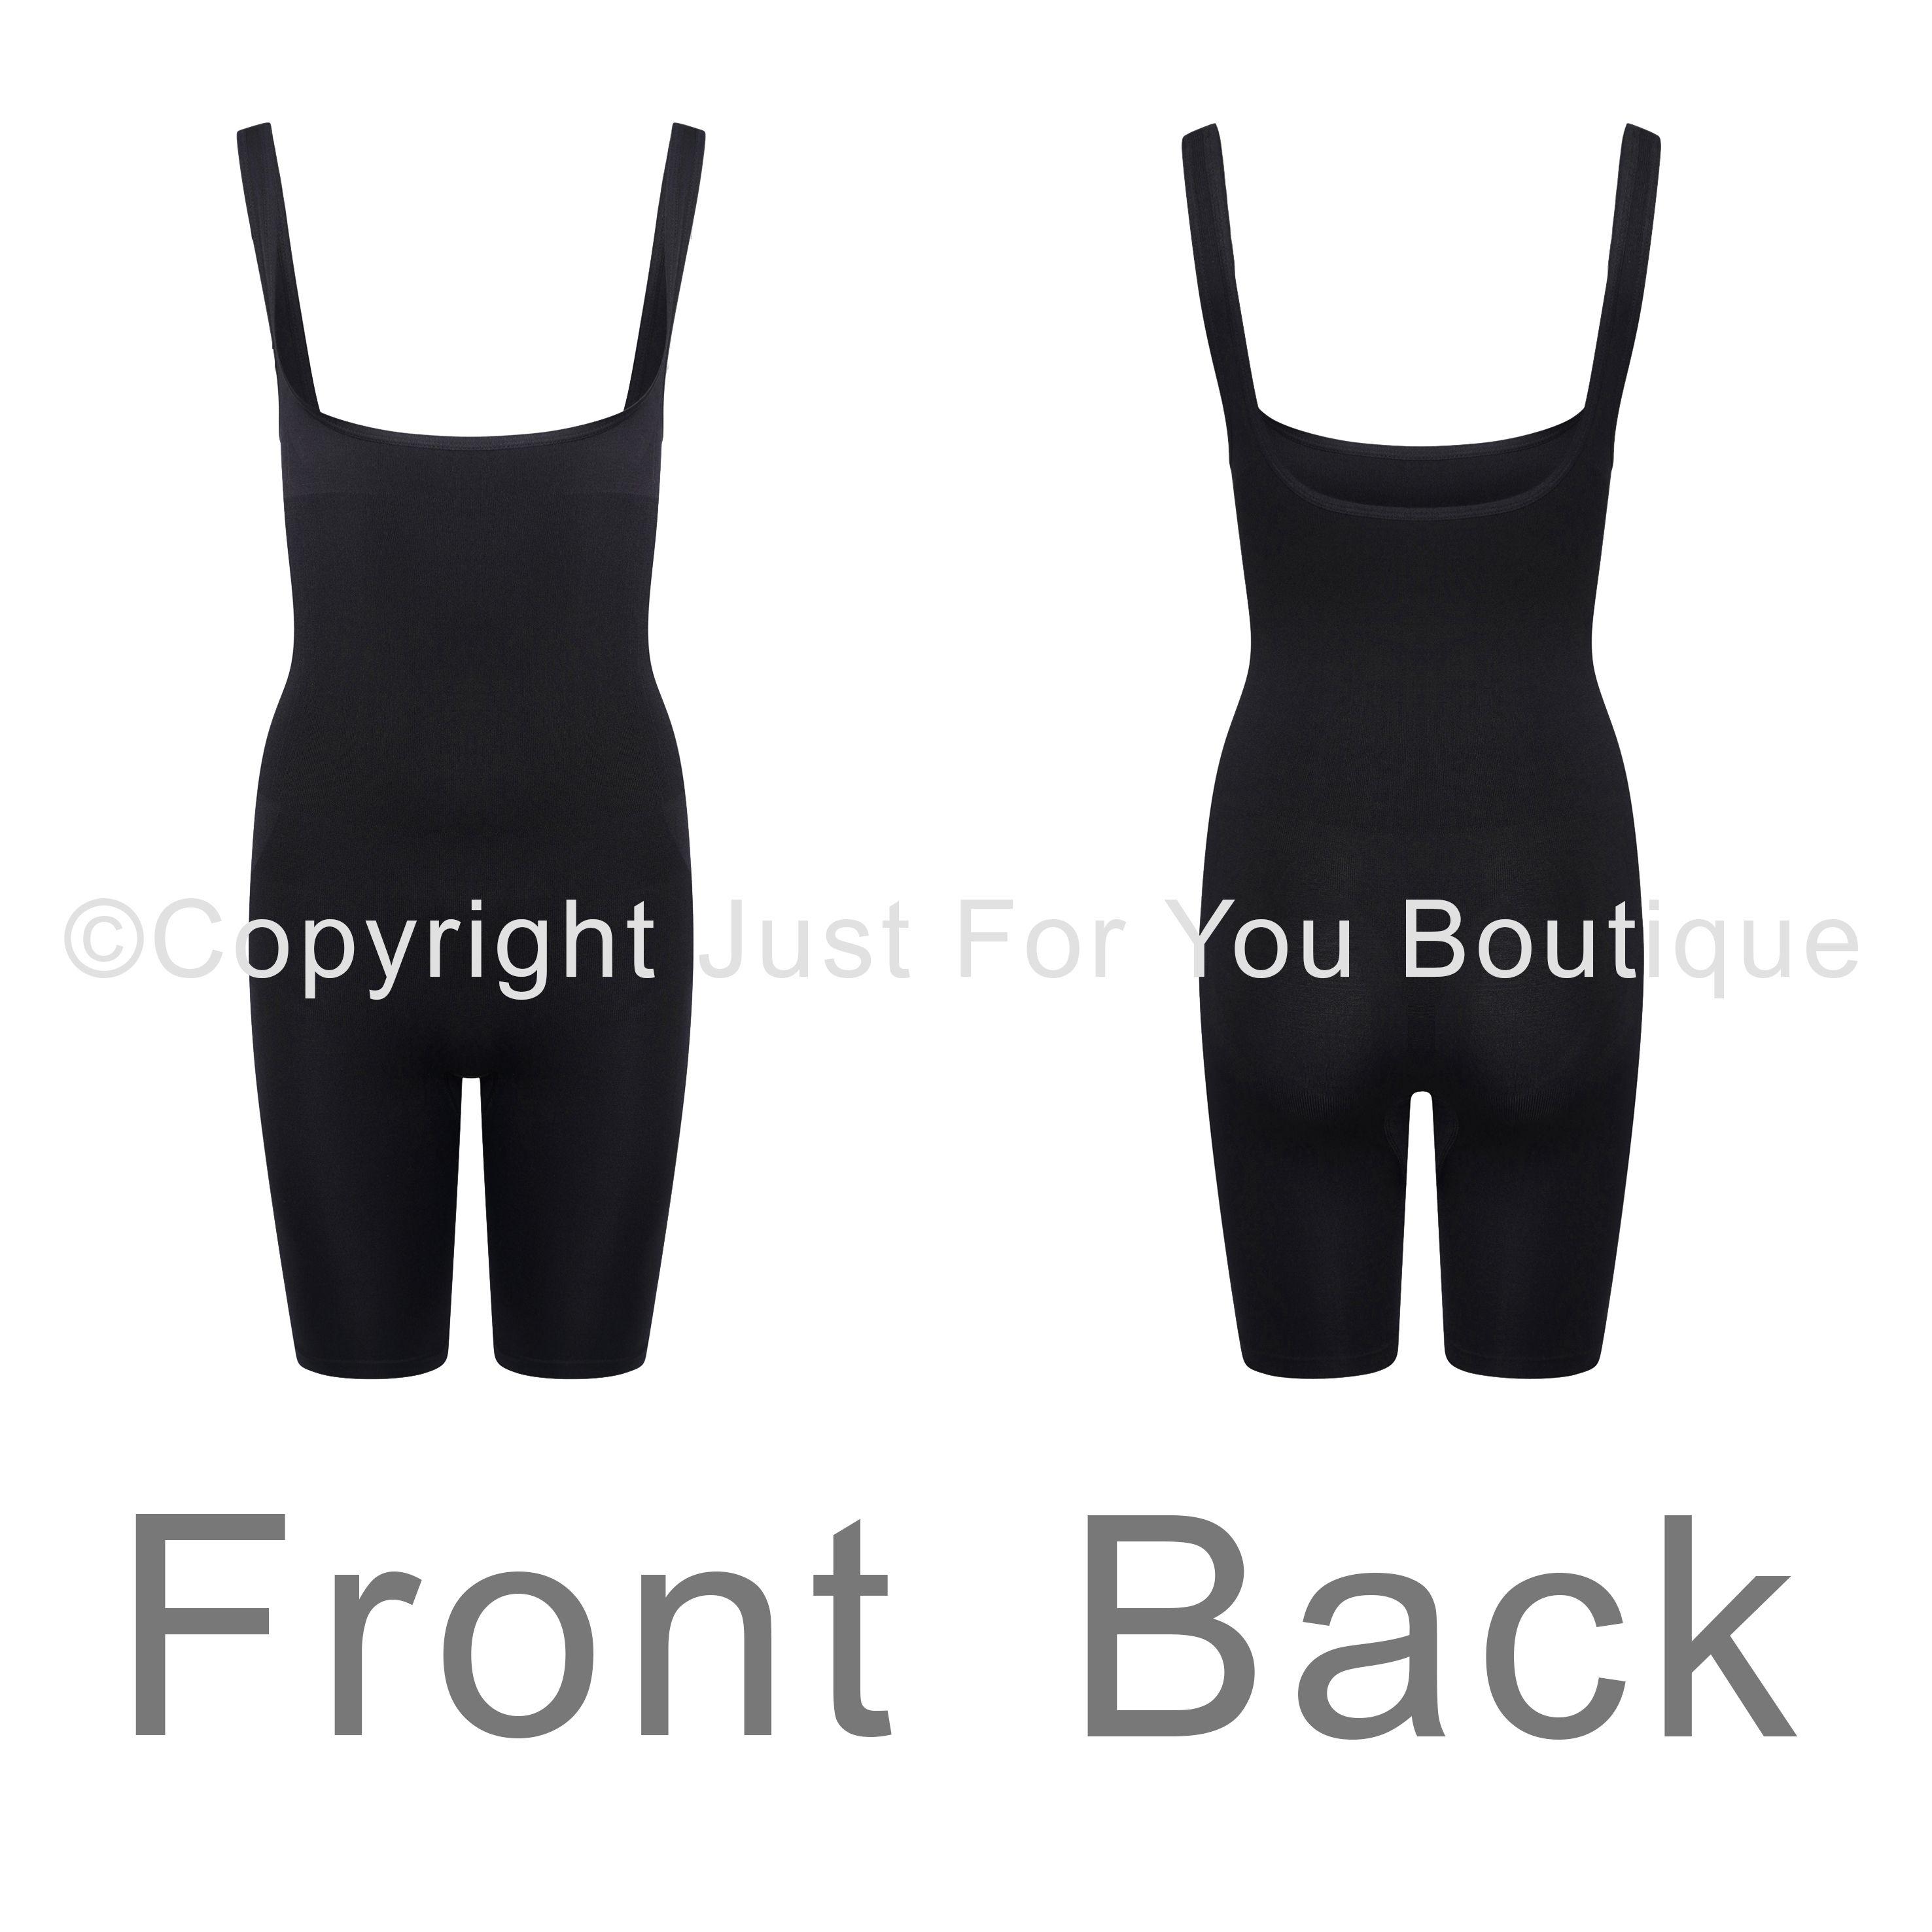 Control Knickers Shorts Seamless Shapewear Black Nude Size 8 10 12 14 16 18 20